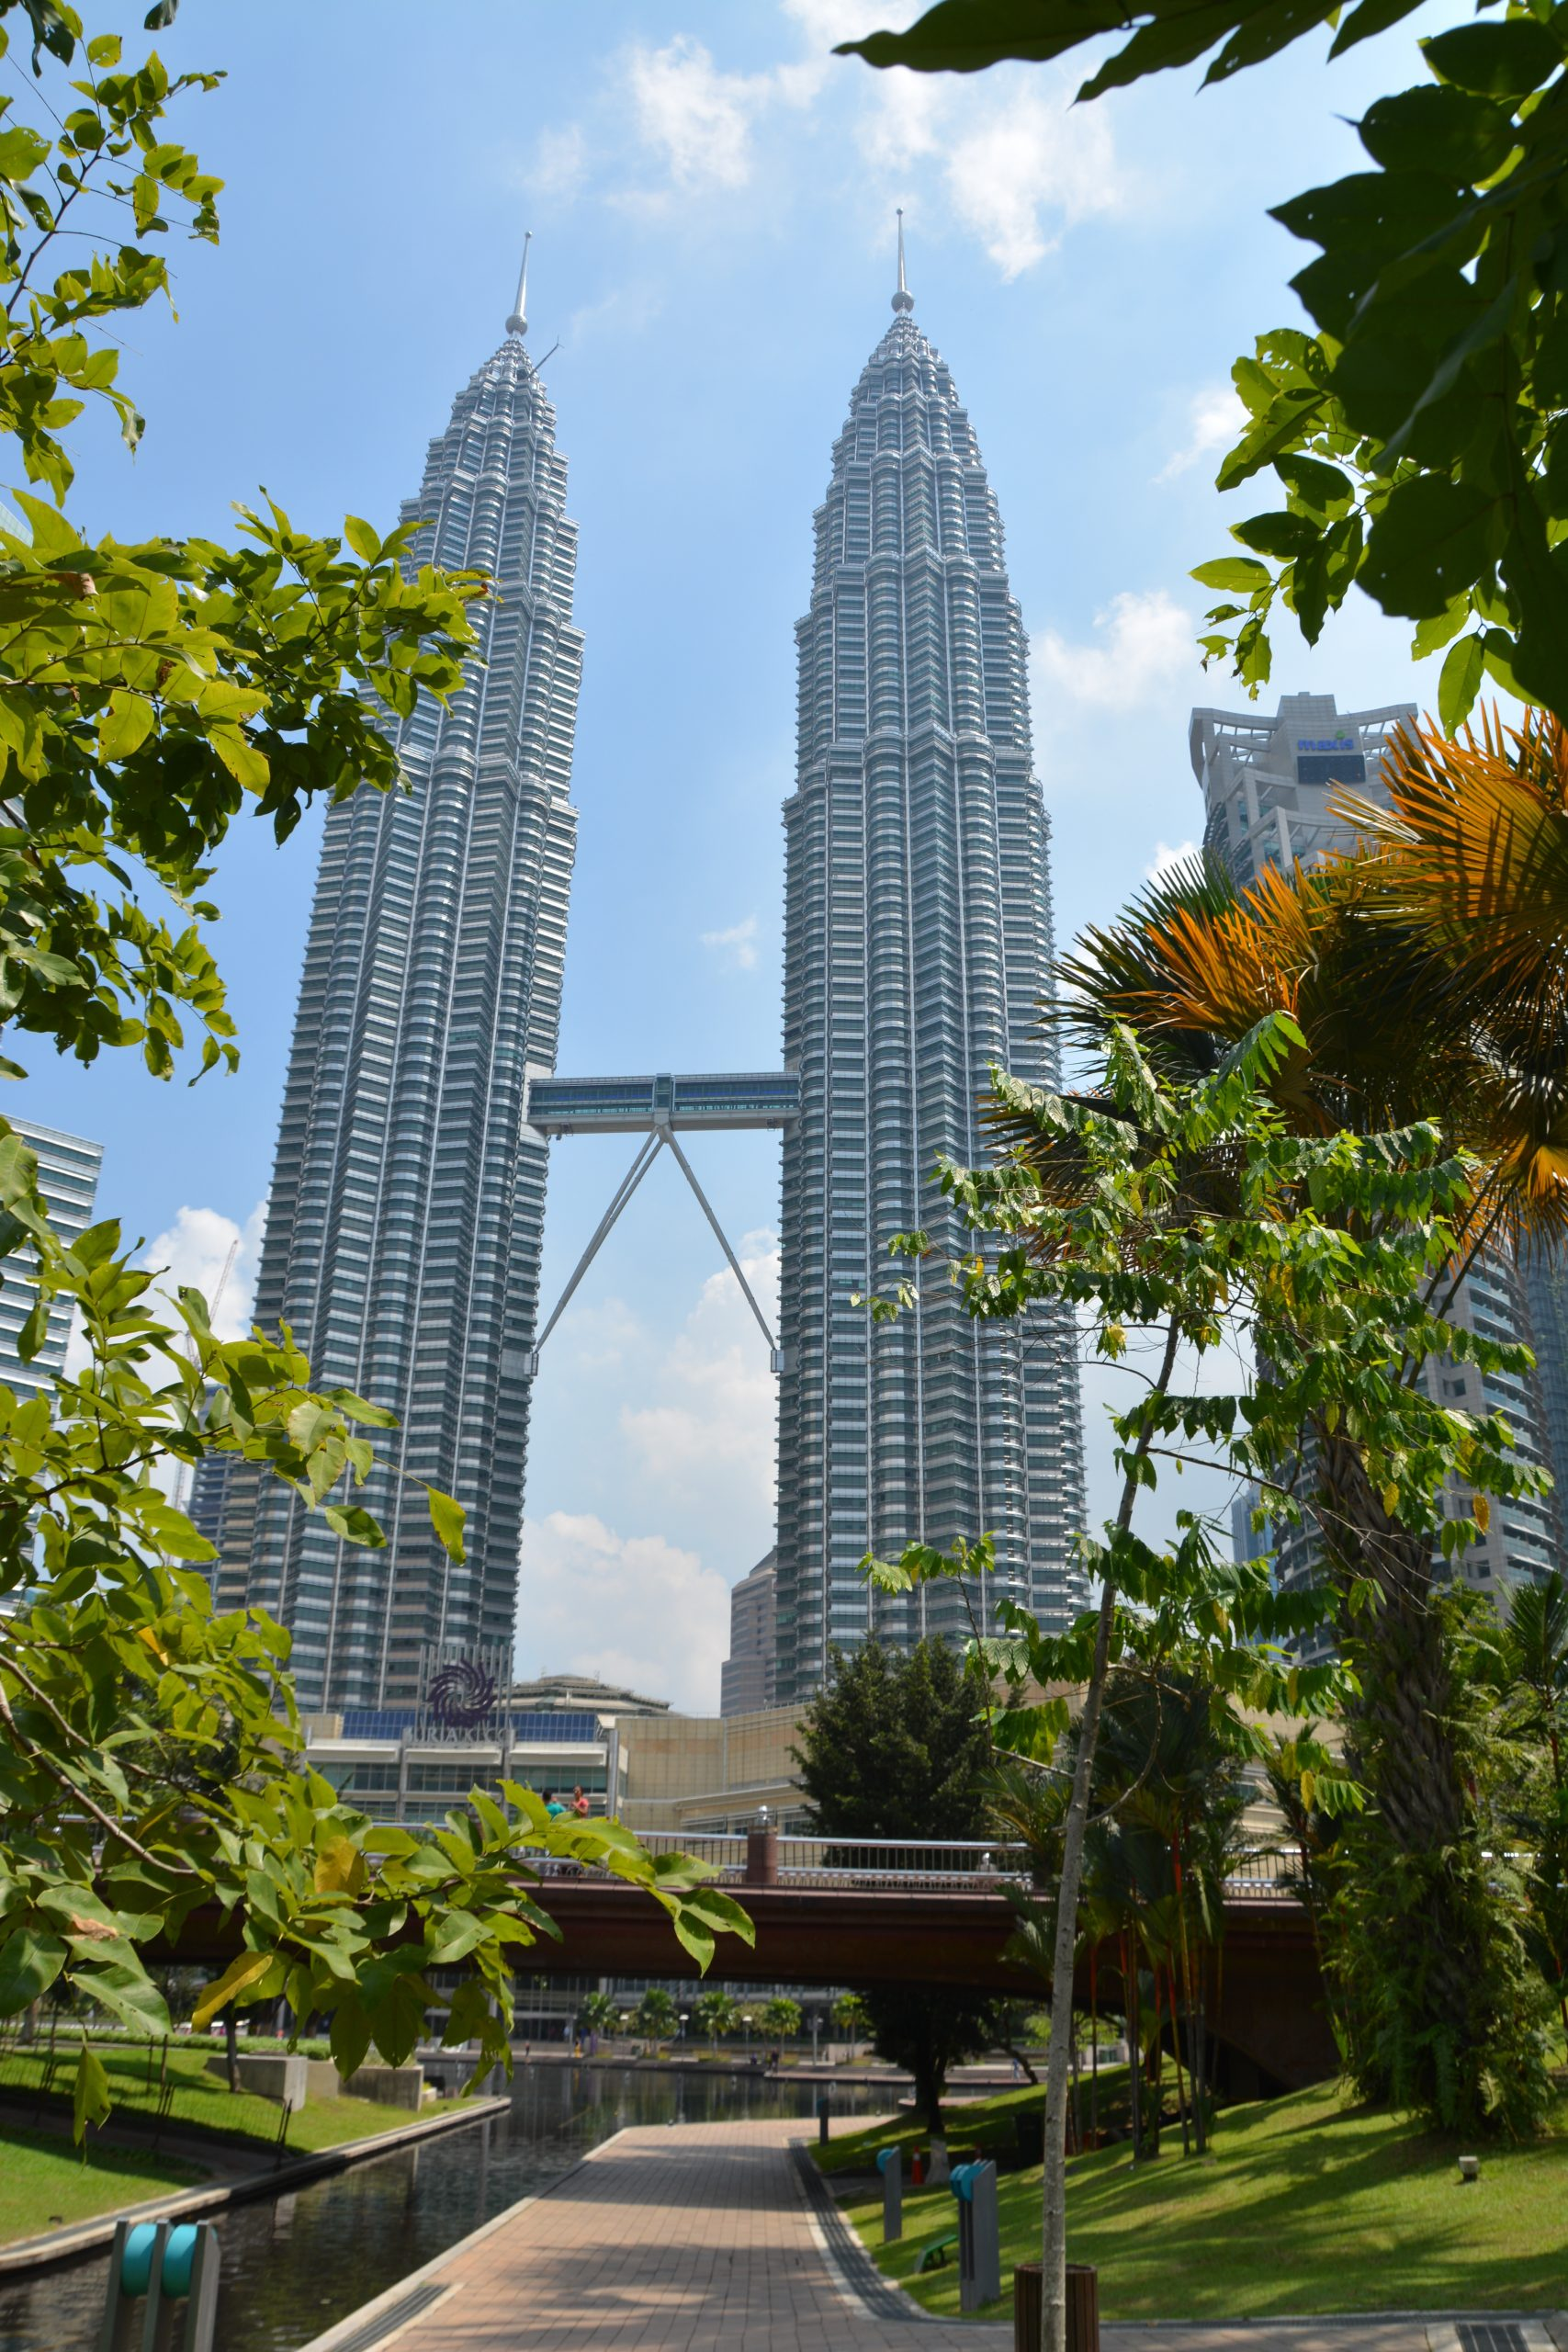 qué ver en Kuala Lumpur KLCC Park